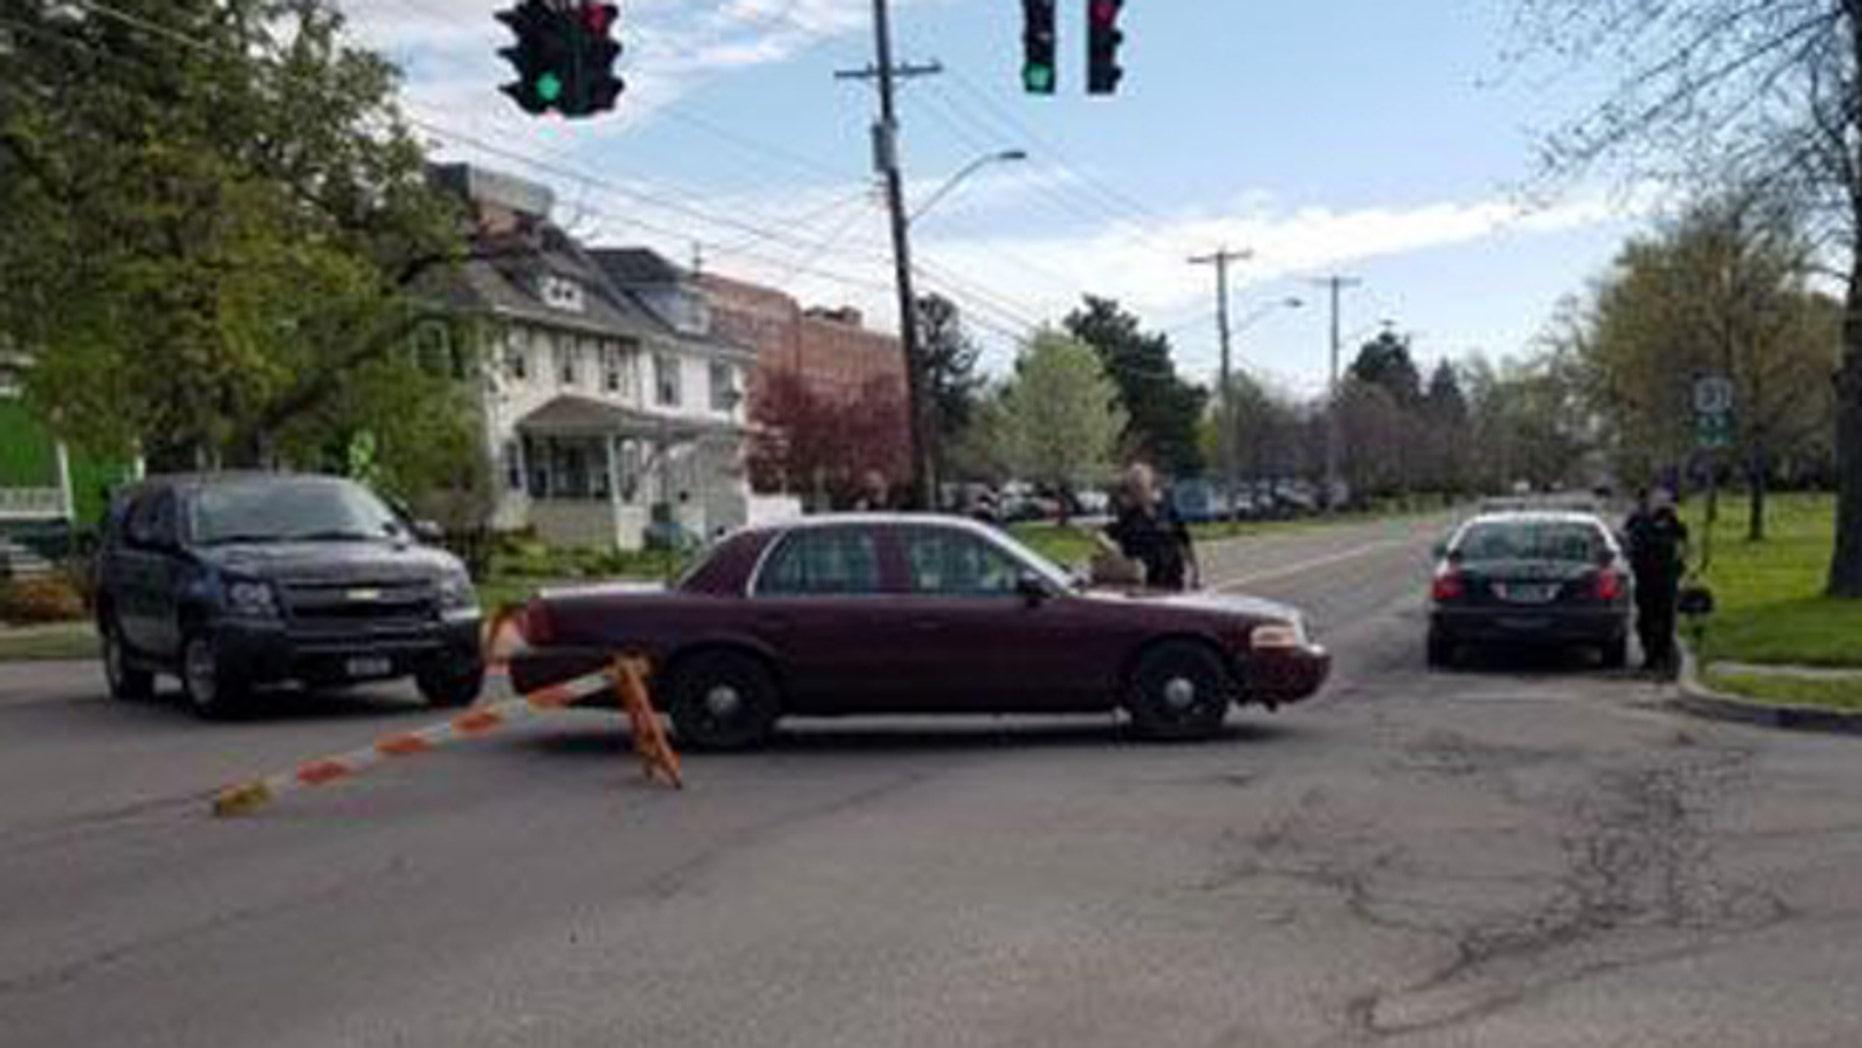 Police block off street after holdup at hospital near Buffalo, N.Y. (Harold McNeil/ Buffalo News)